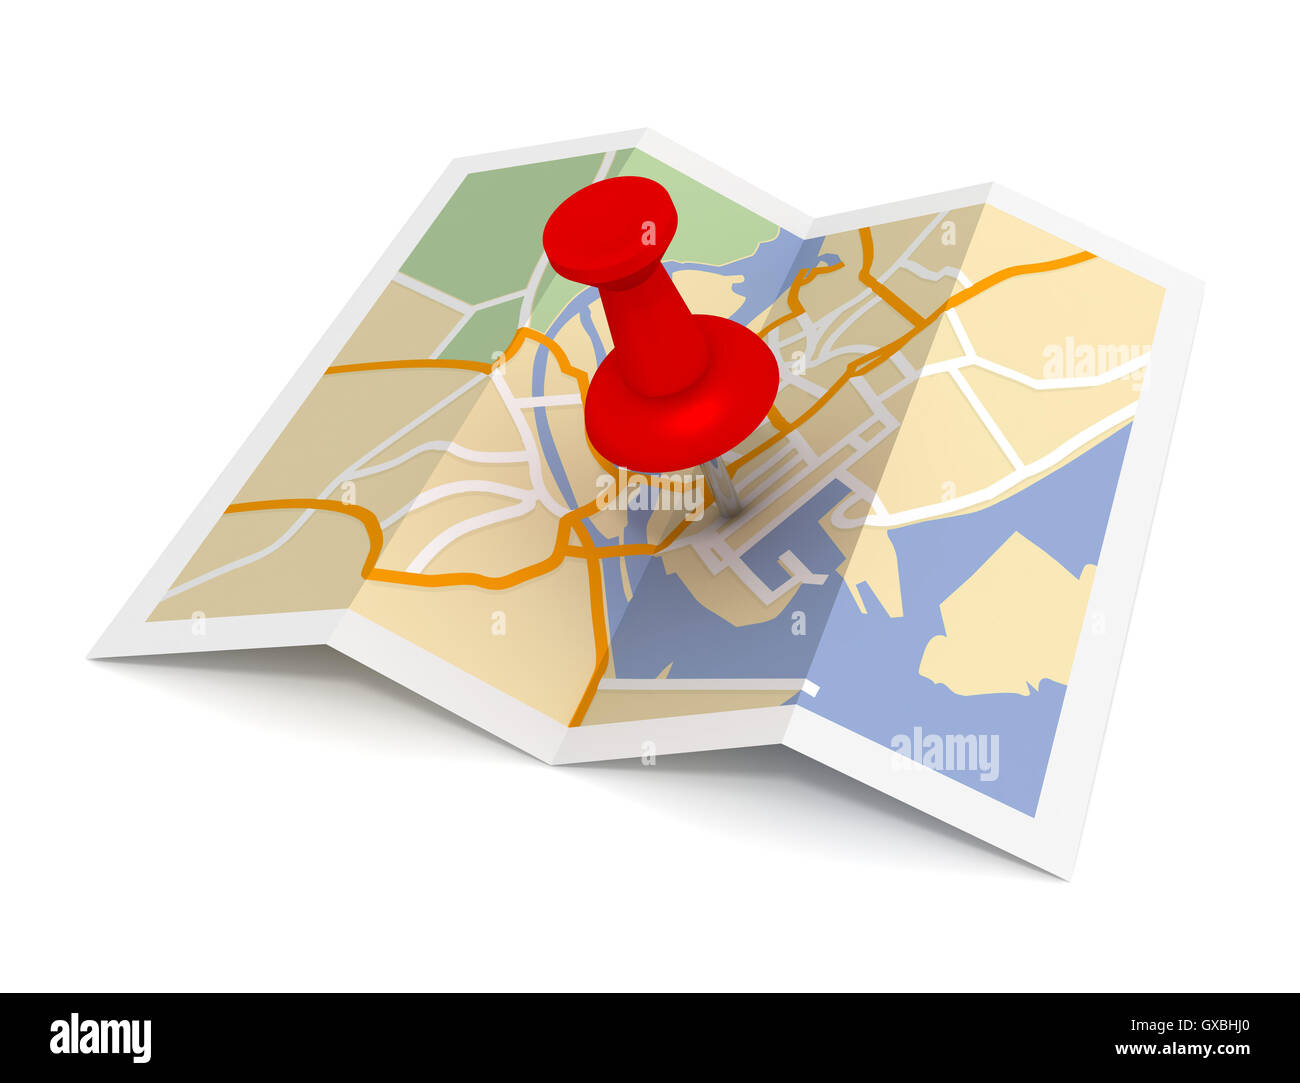 pushpin on map 3d illustration - Stock Image